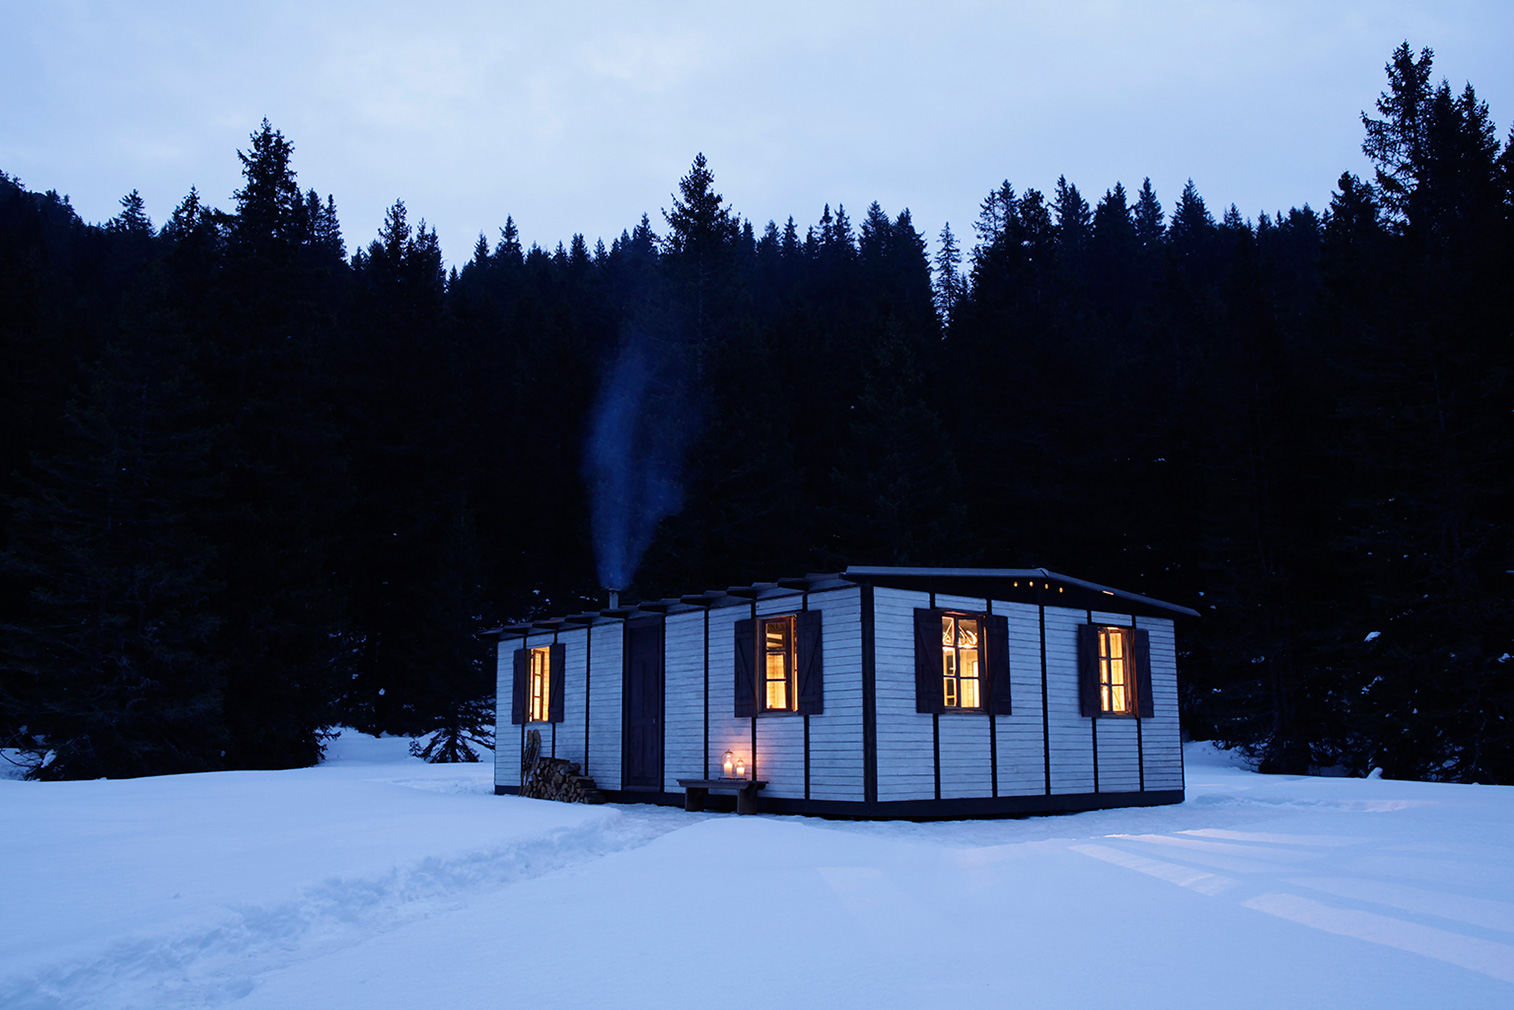 Midcentury cabins: Jean Prouvé's 6X9 Demountable House